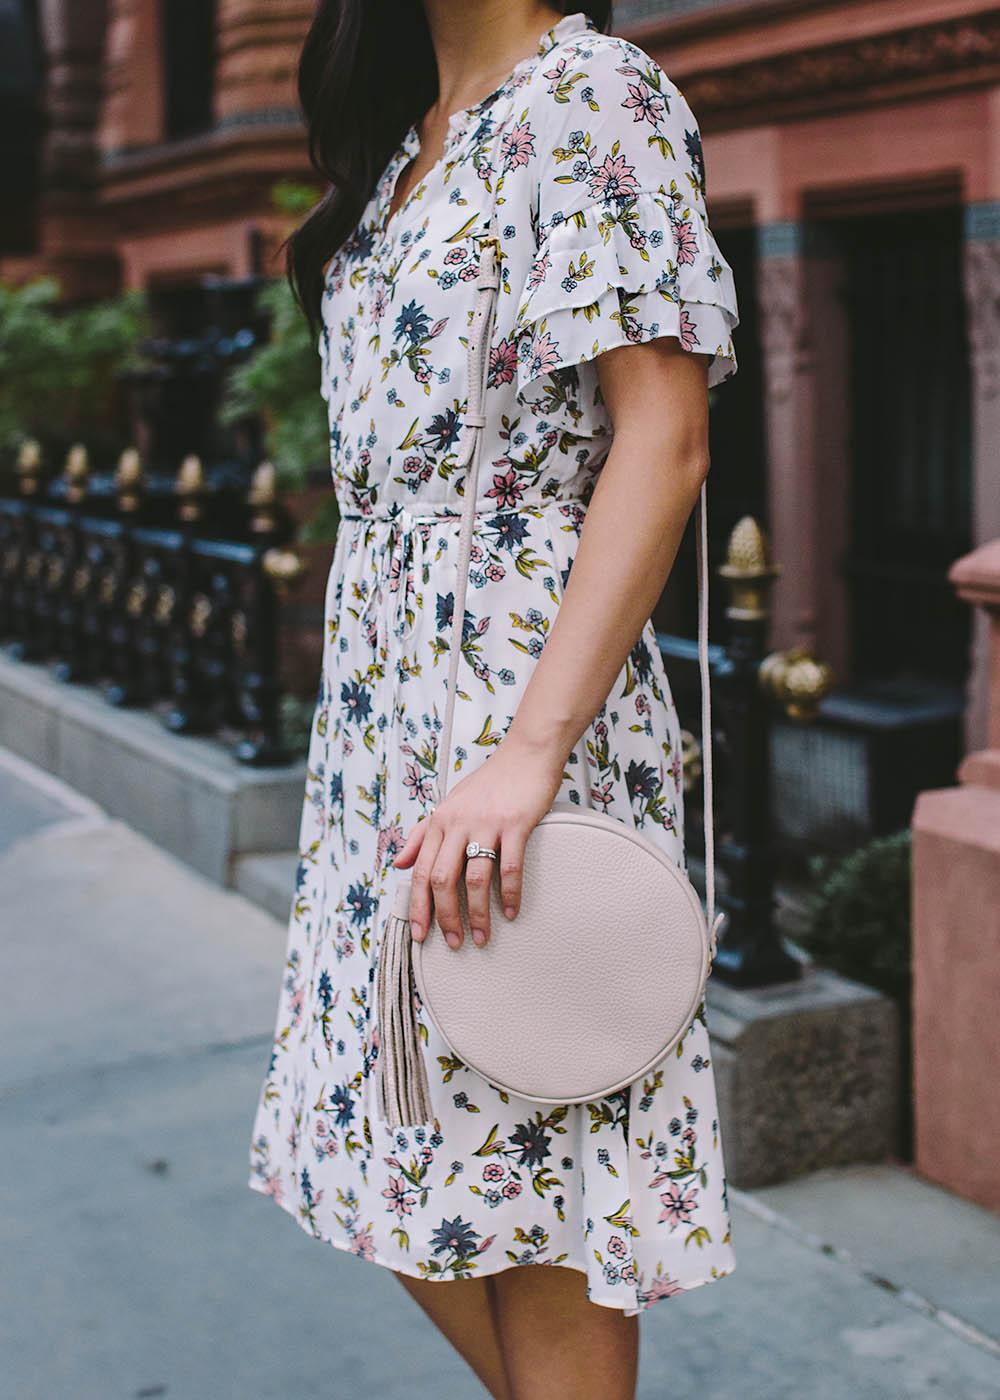 LOFT Wildflower Flounce Dress & GiGi New York Circle Bag